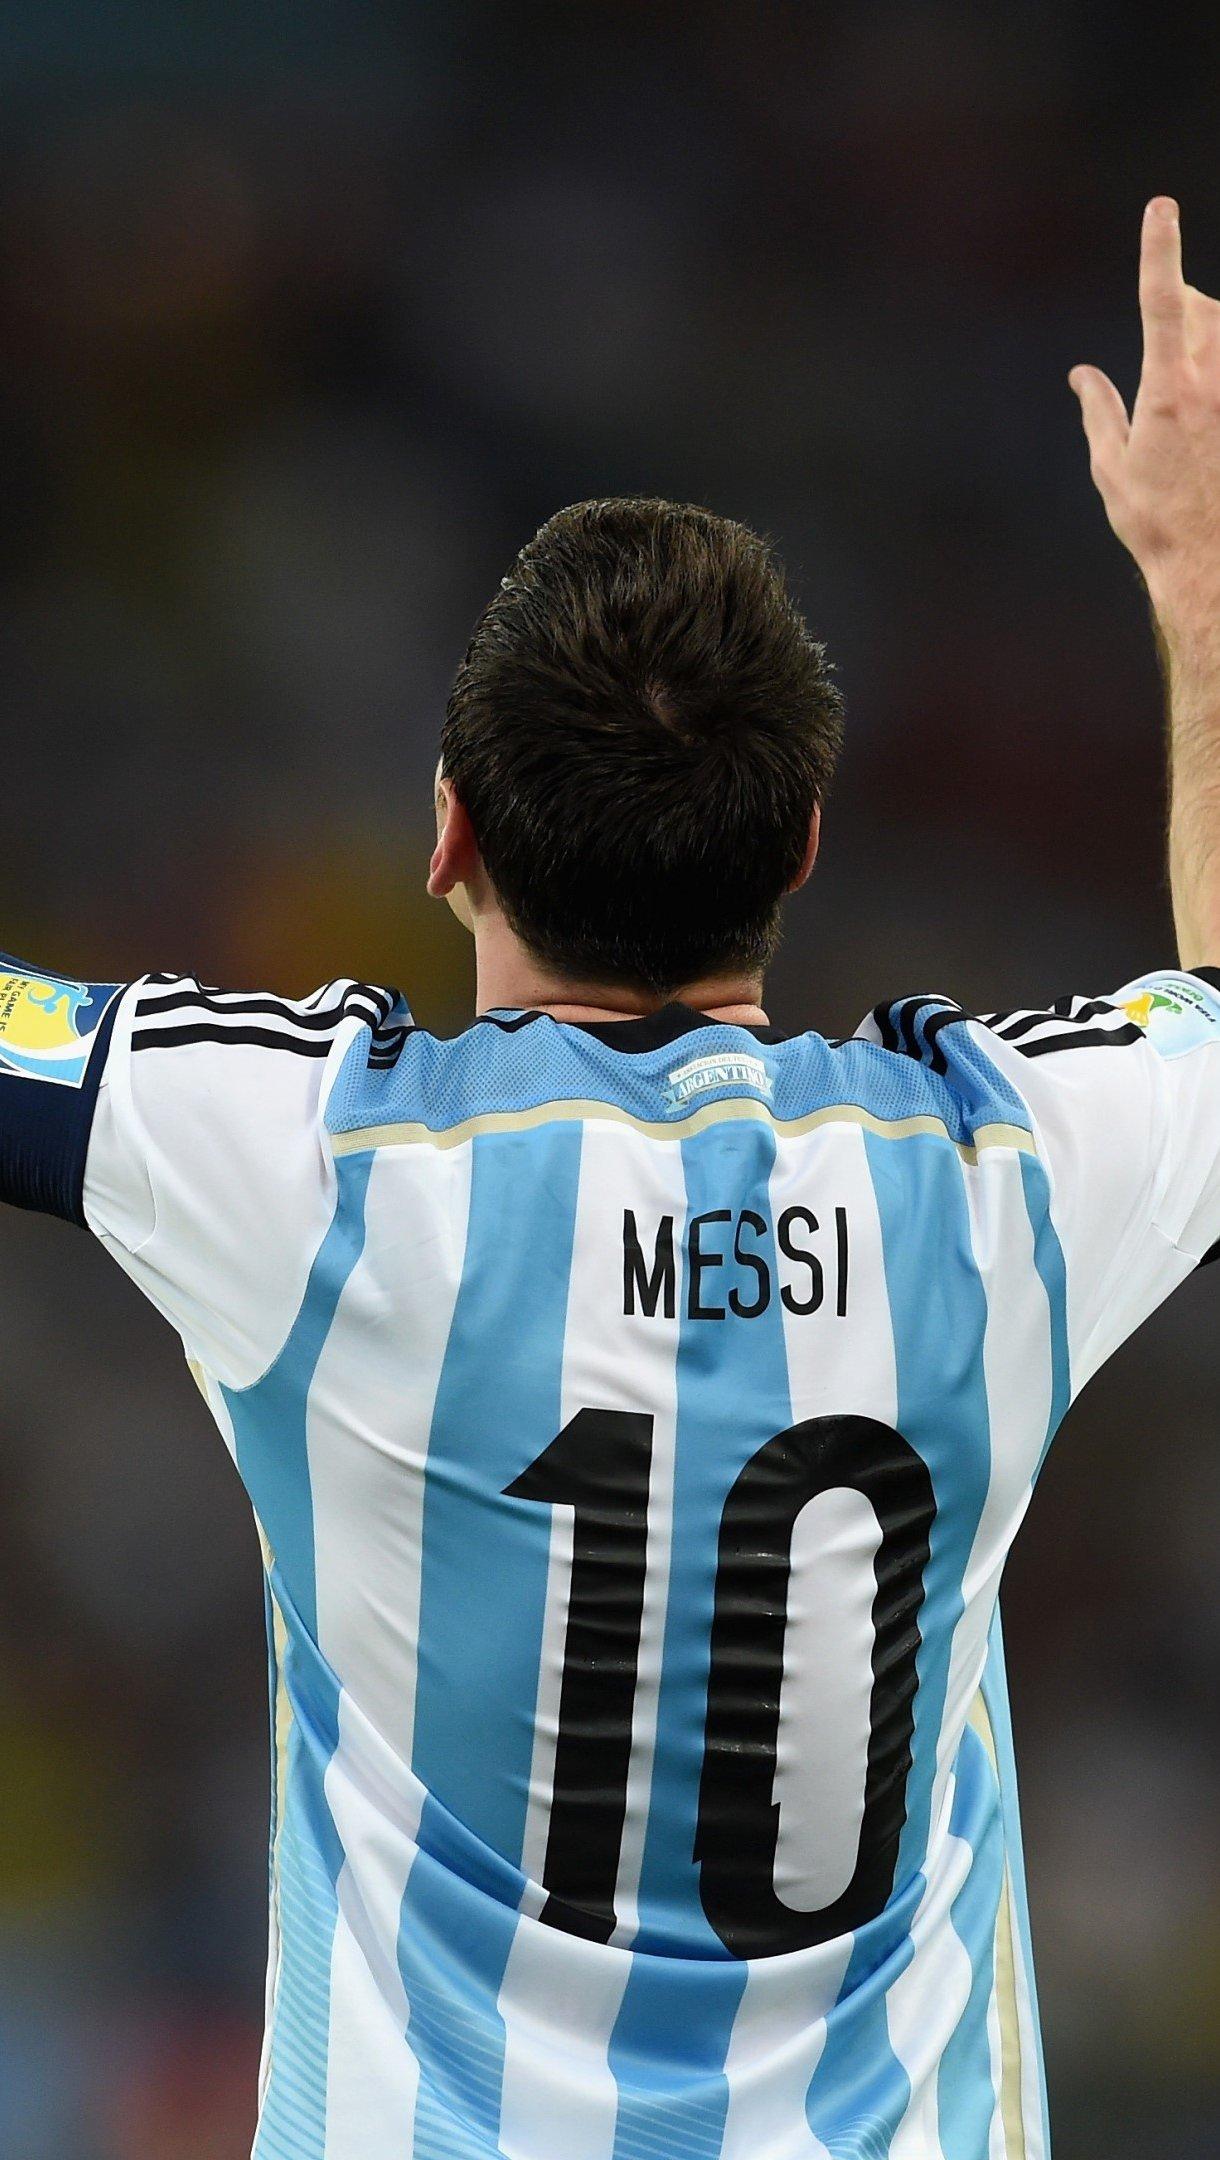 Wallpaper Lionel Messi in a stadium Vertical